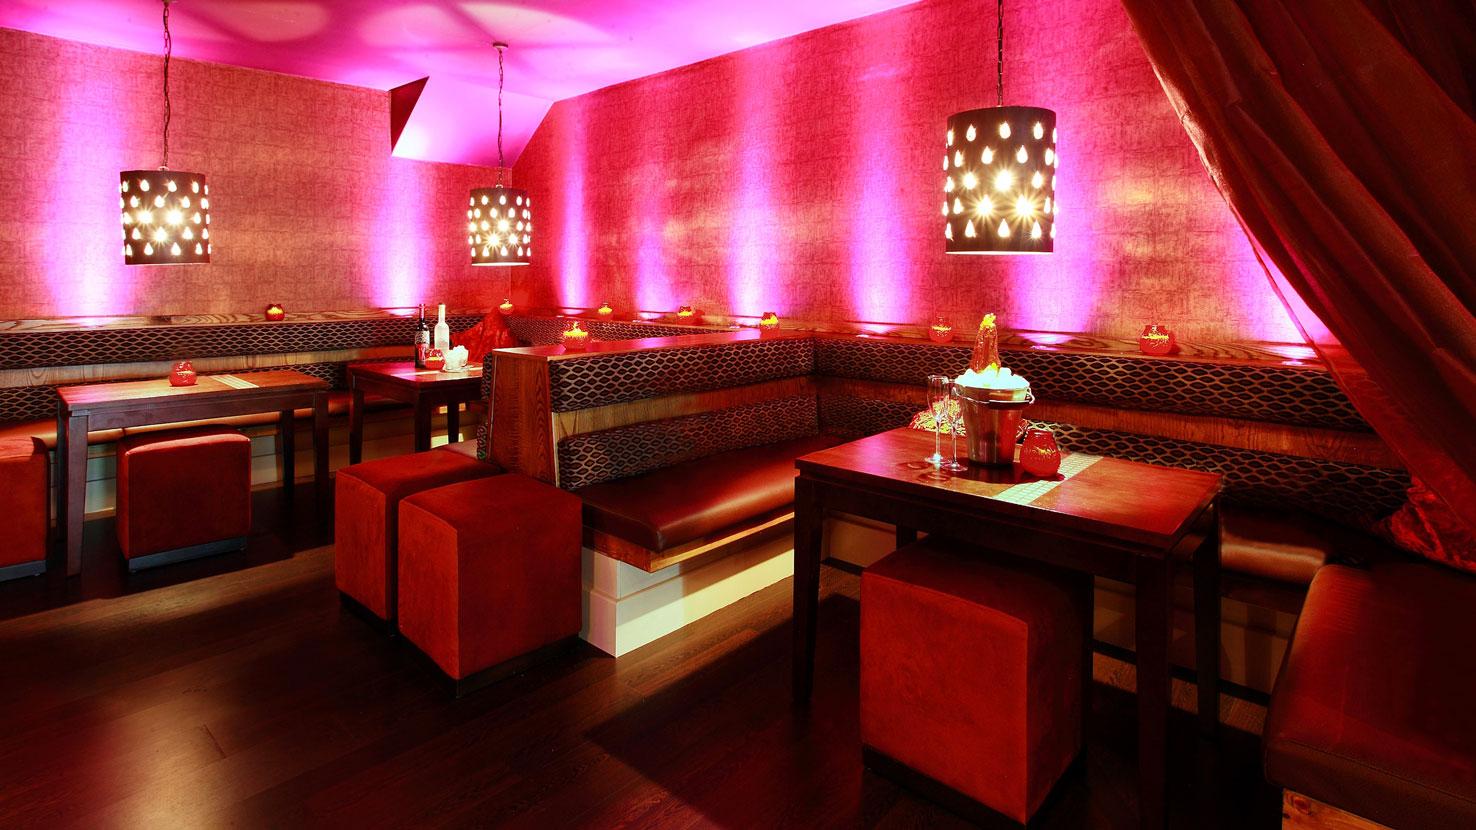 Bar restaurant interiors